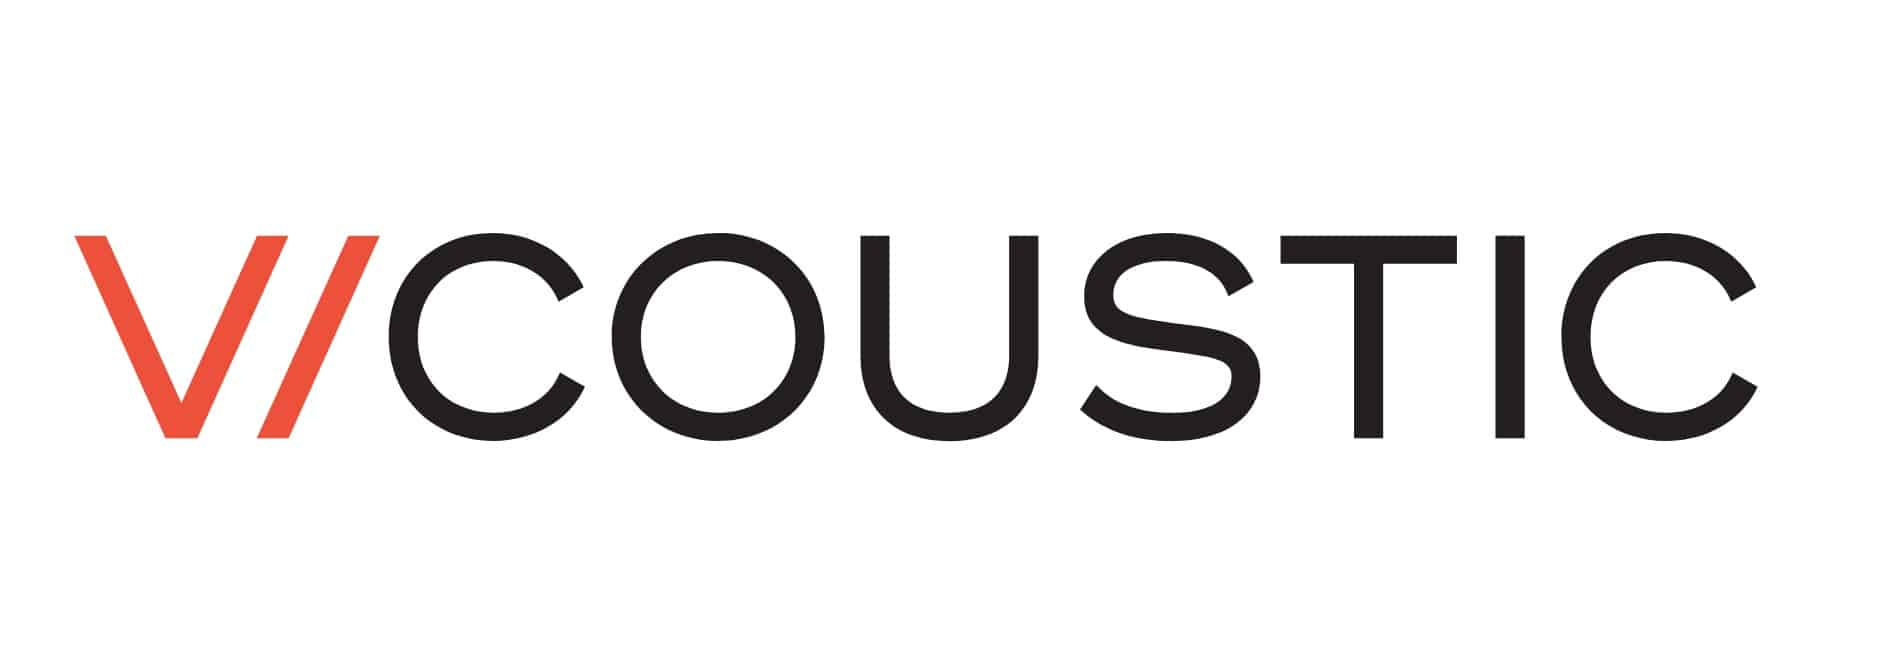 logo Vicoustic